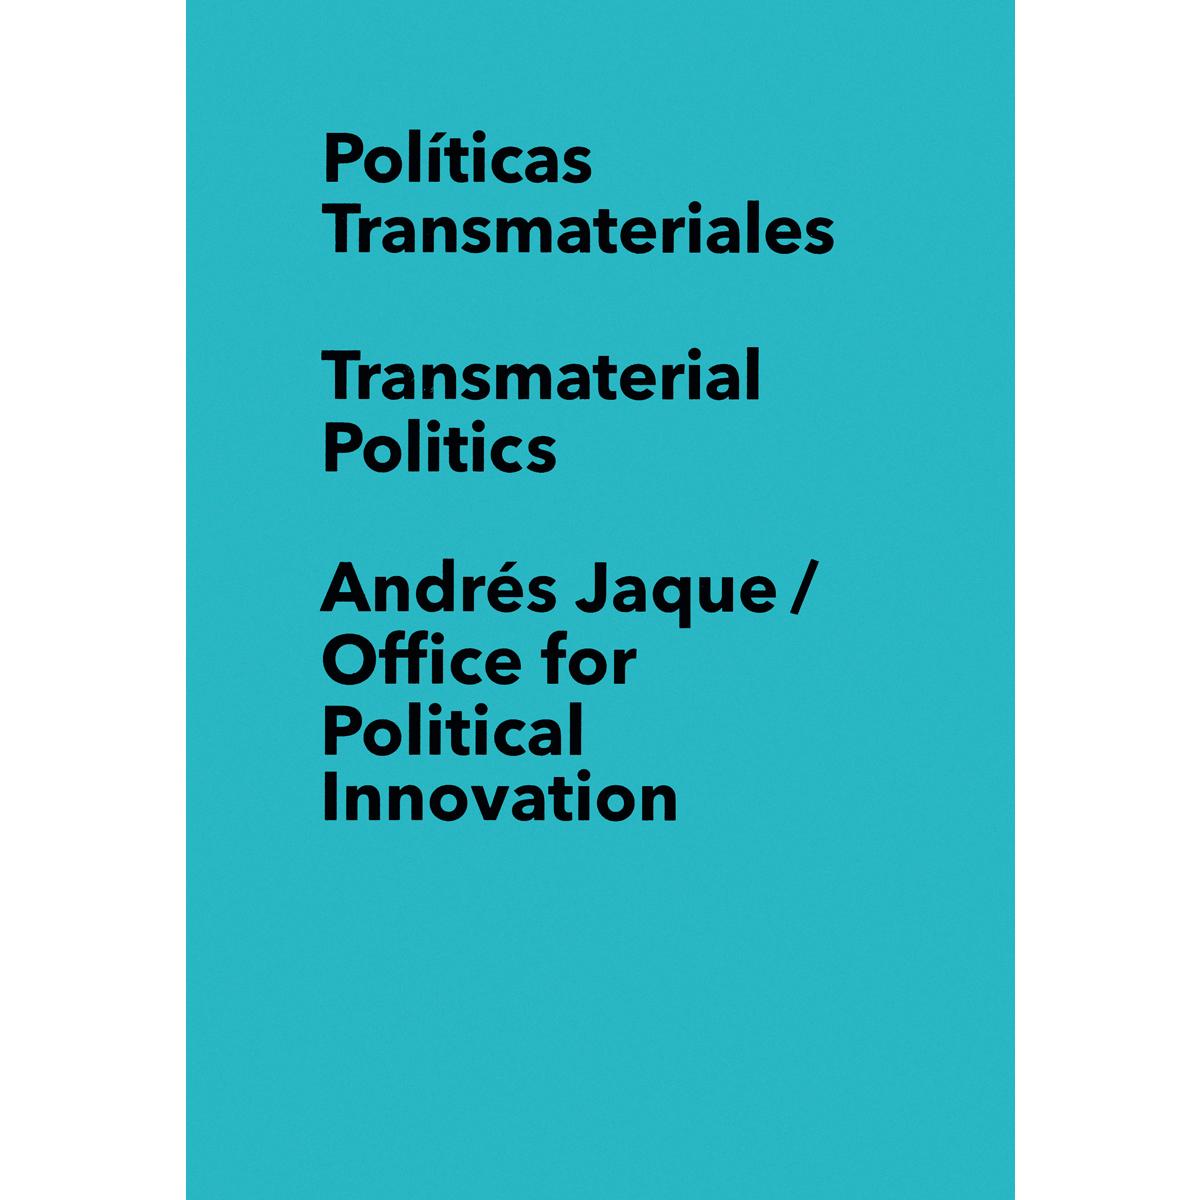 Transmateriales Polítics